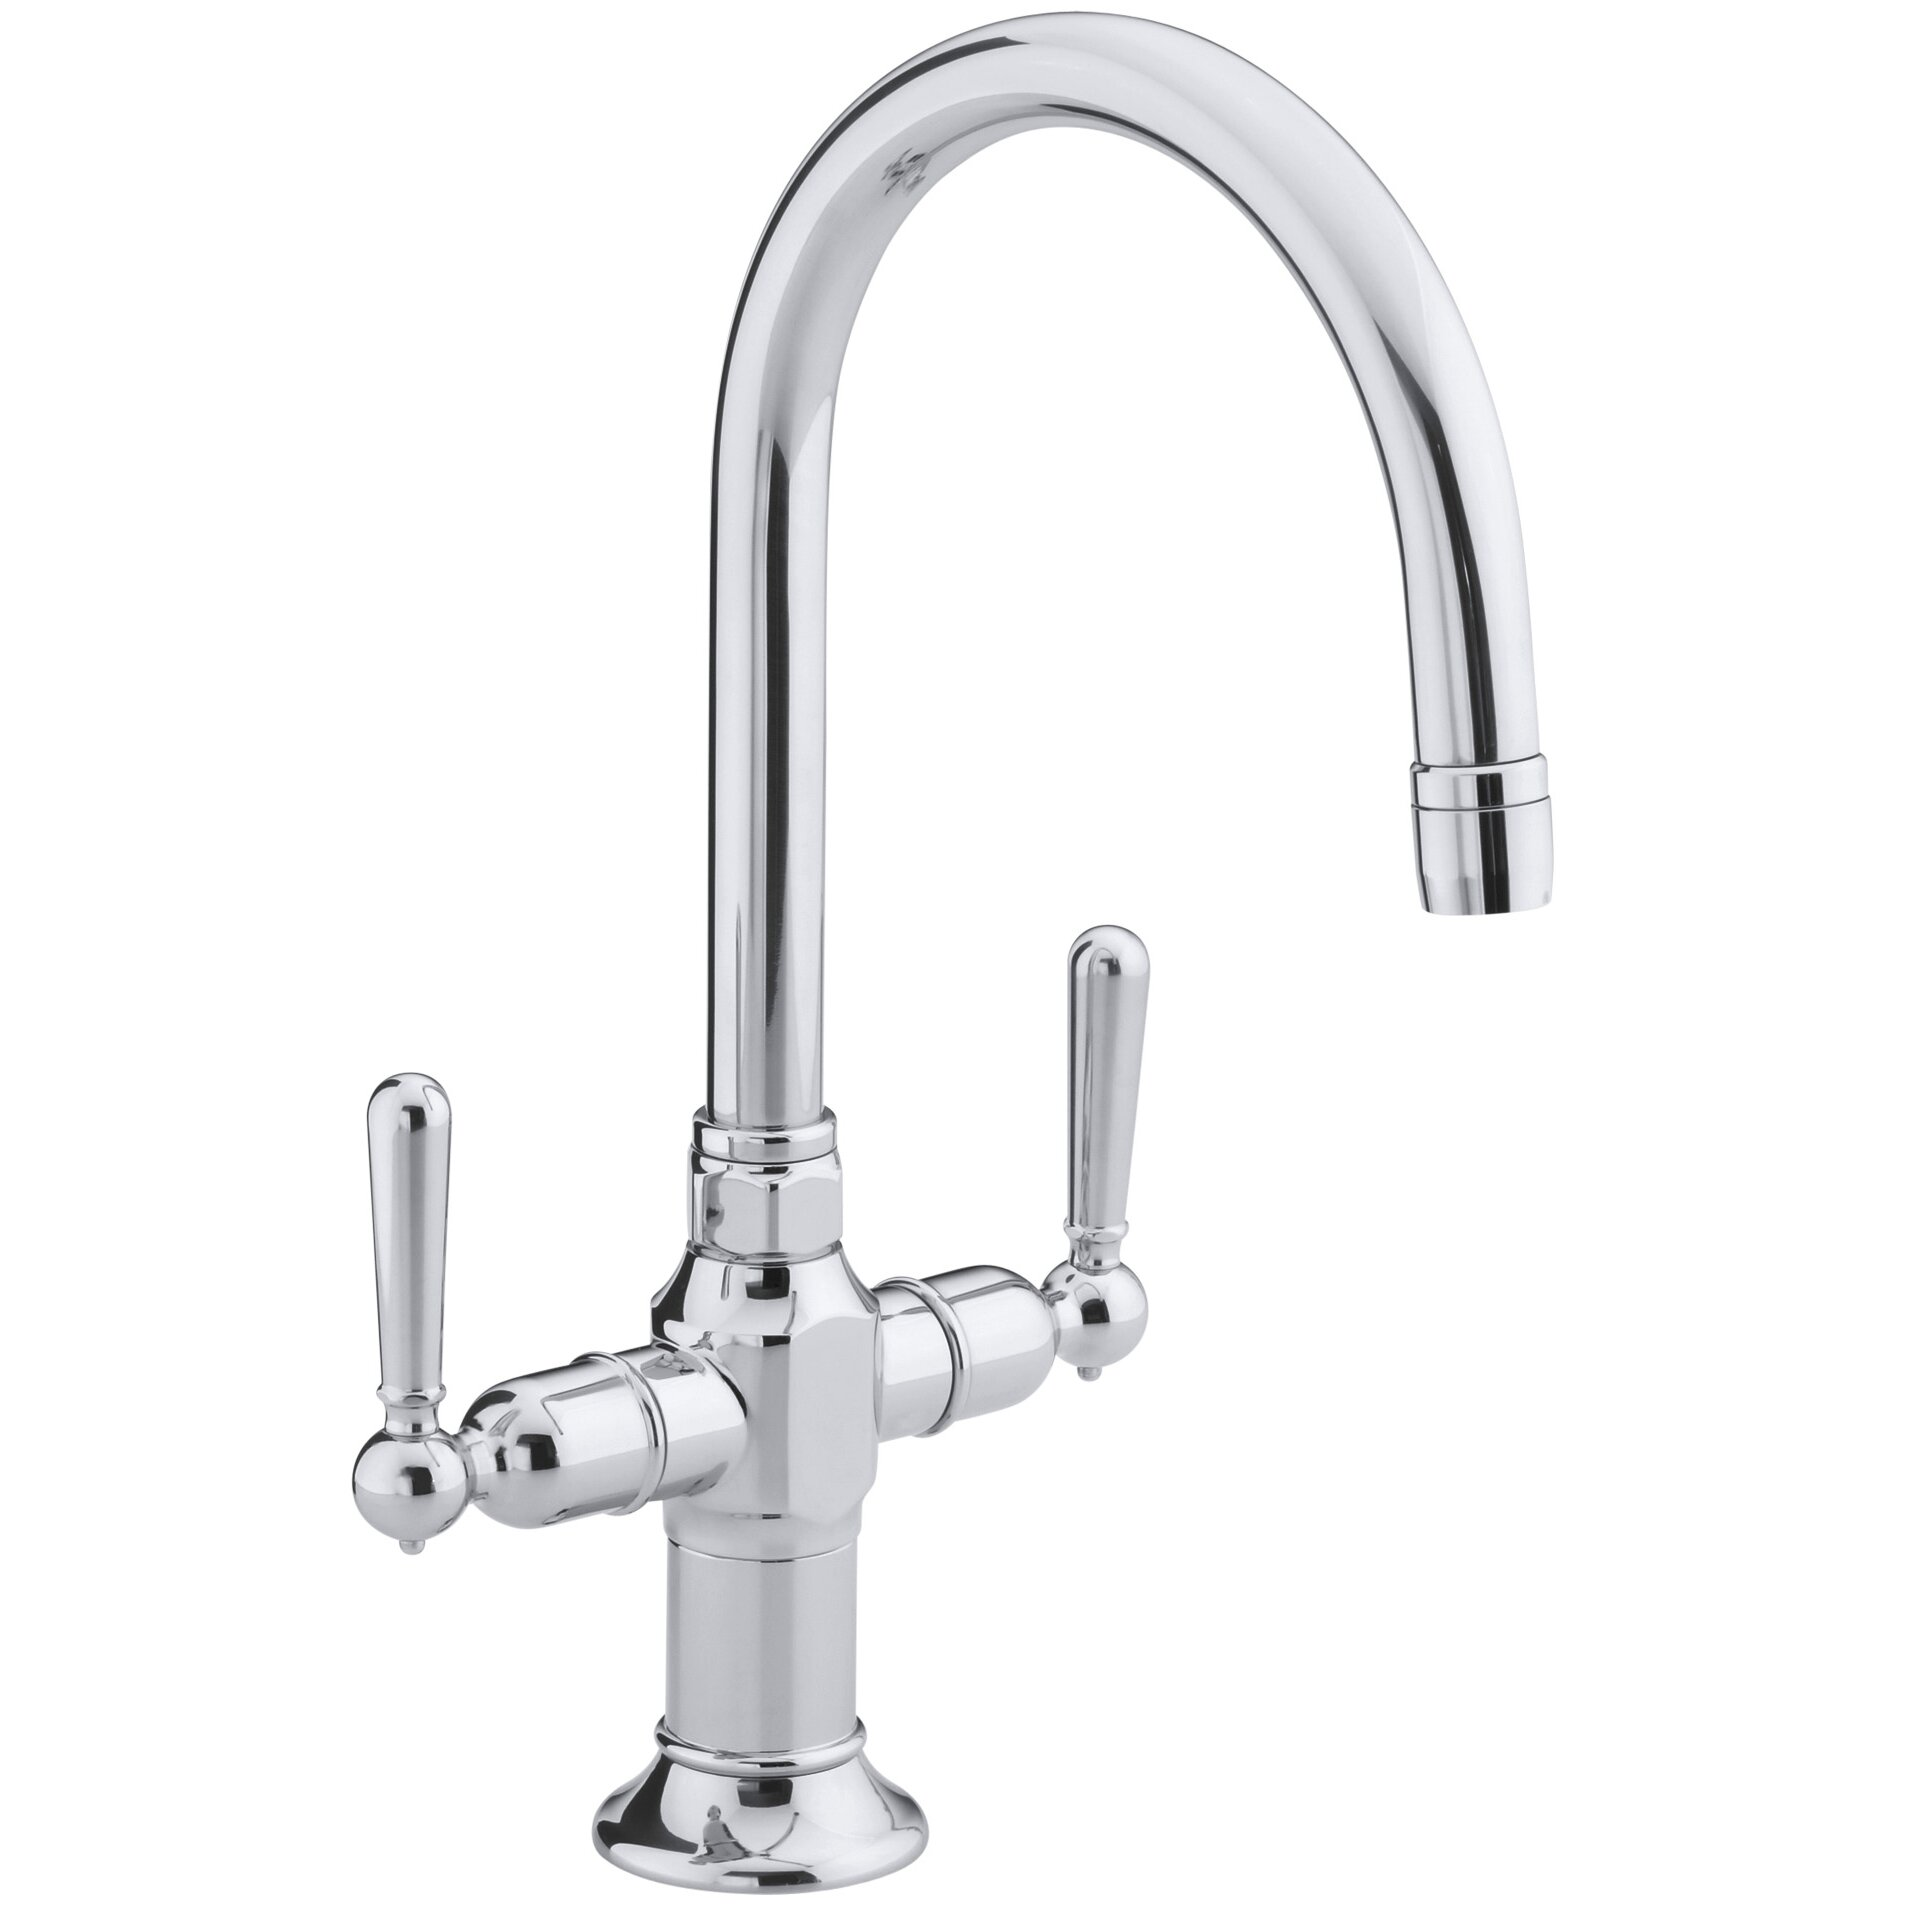 Kohler Bar Sink Faucet : Kohler Hirisesingle-Hole Bar Sink Faucet with Lever Handles